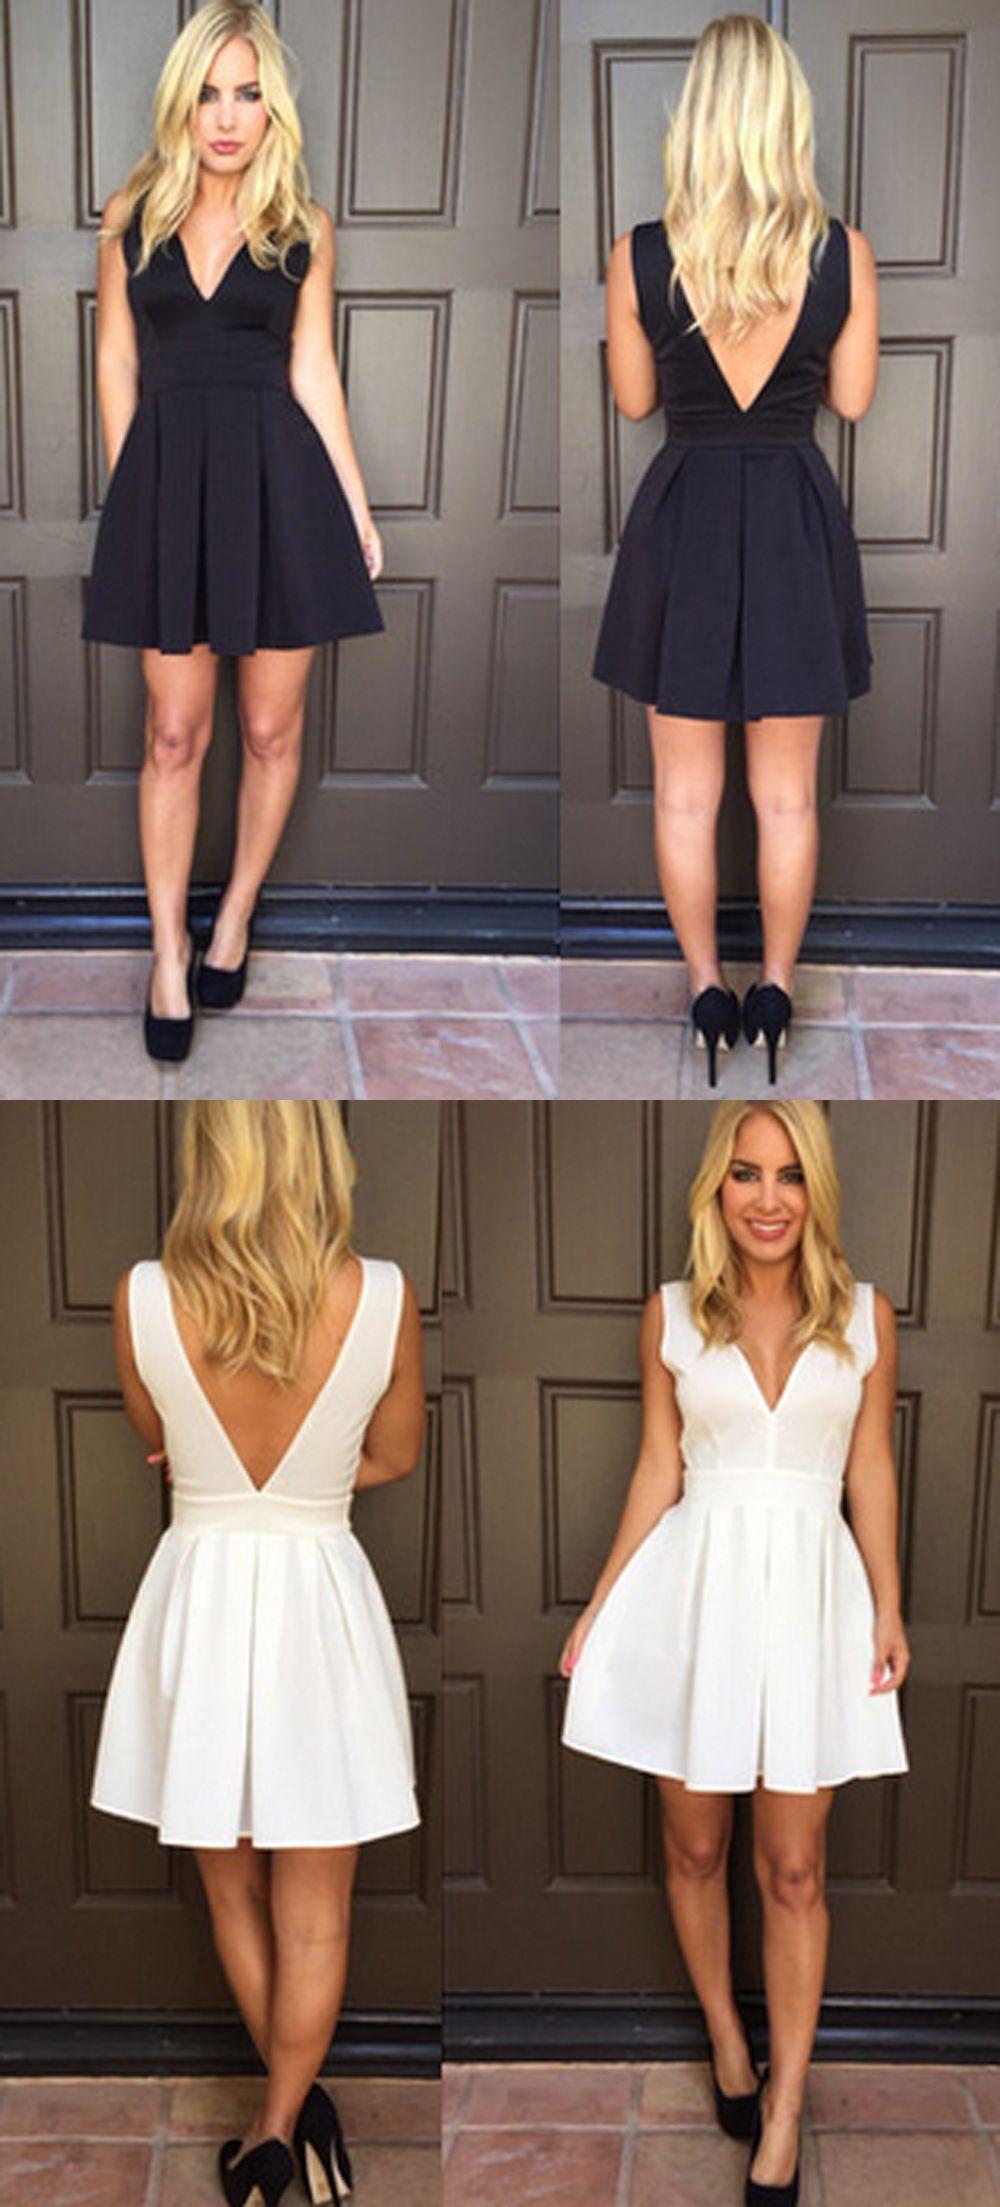 Aline vneck vback black white satin homecoming dress dress